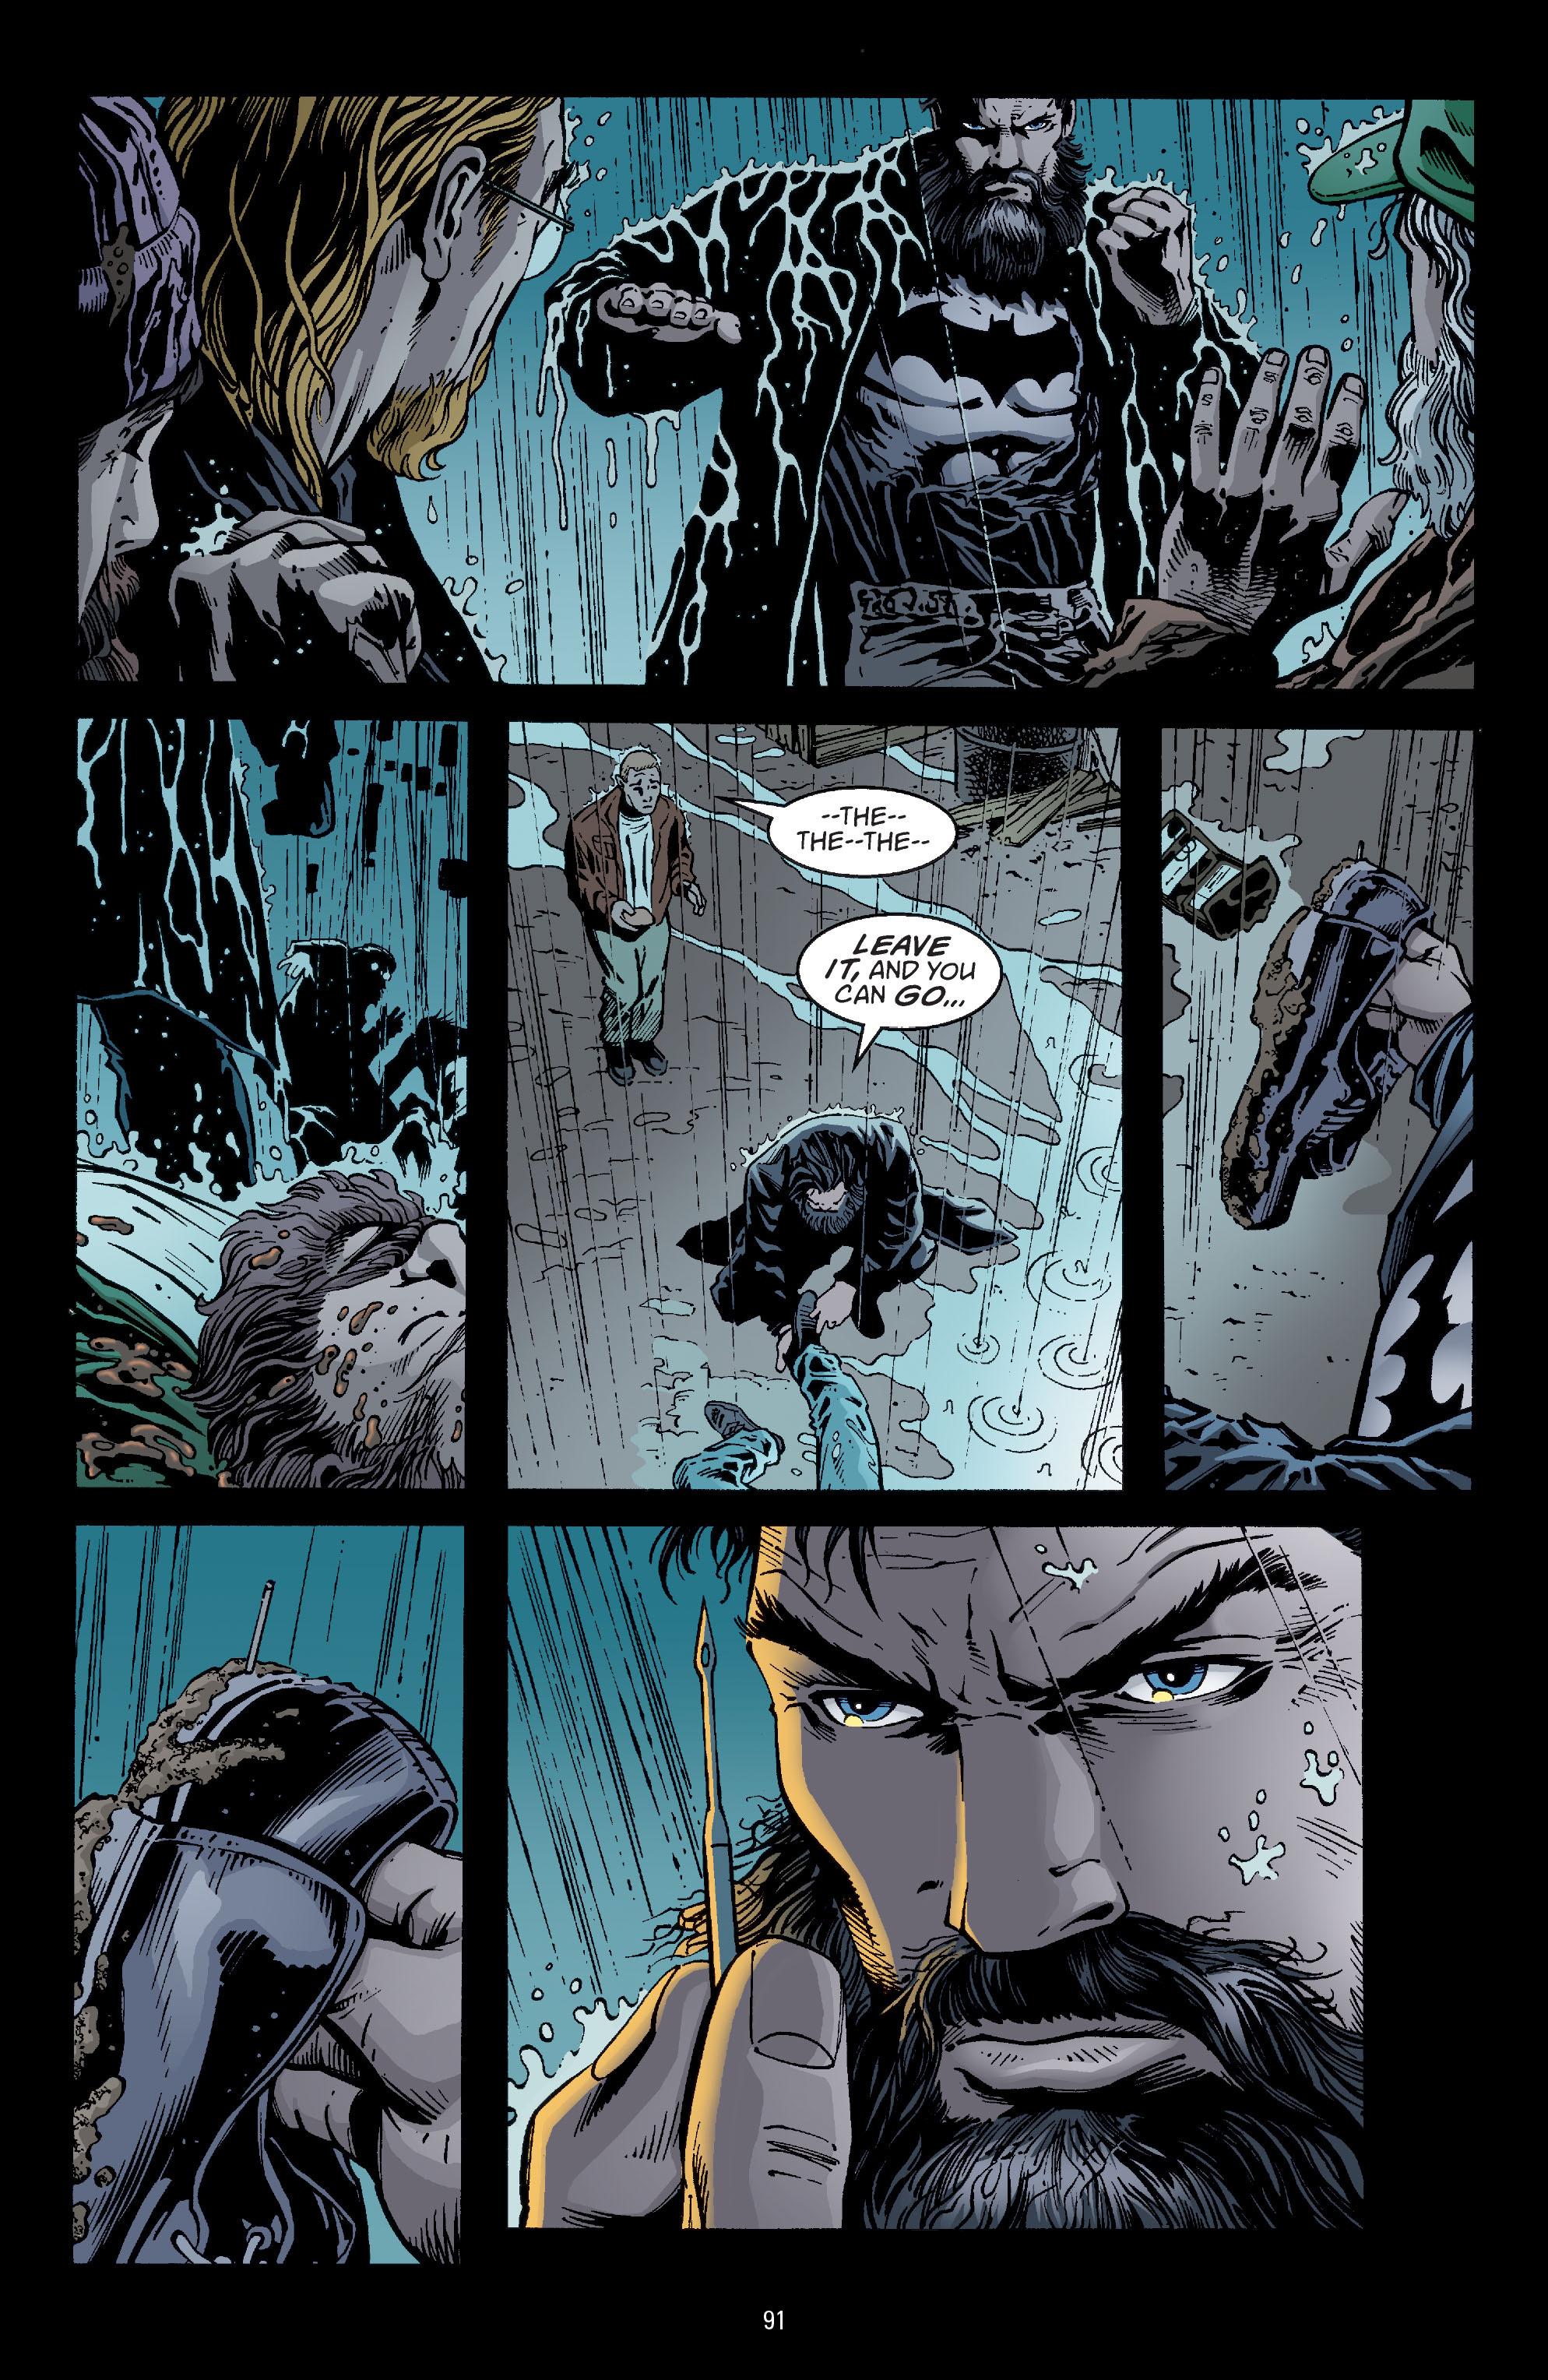 Batman: The Man Who Laughs chap 1 pic 92